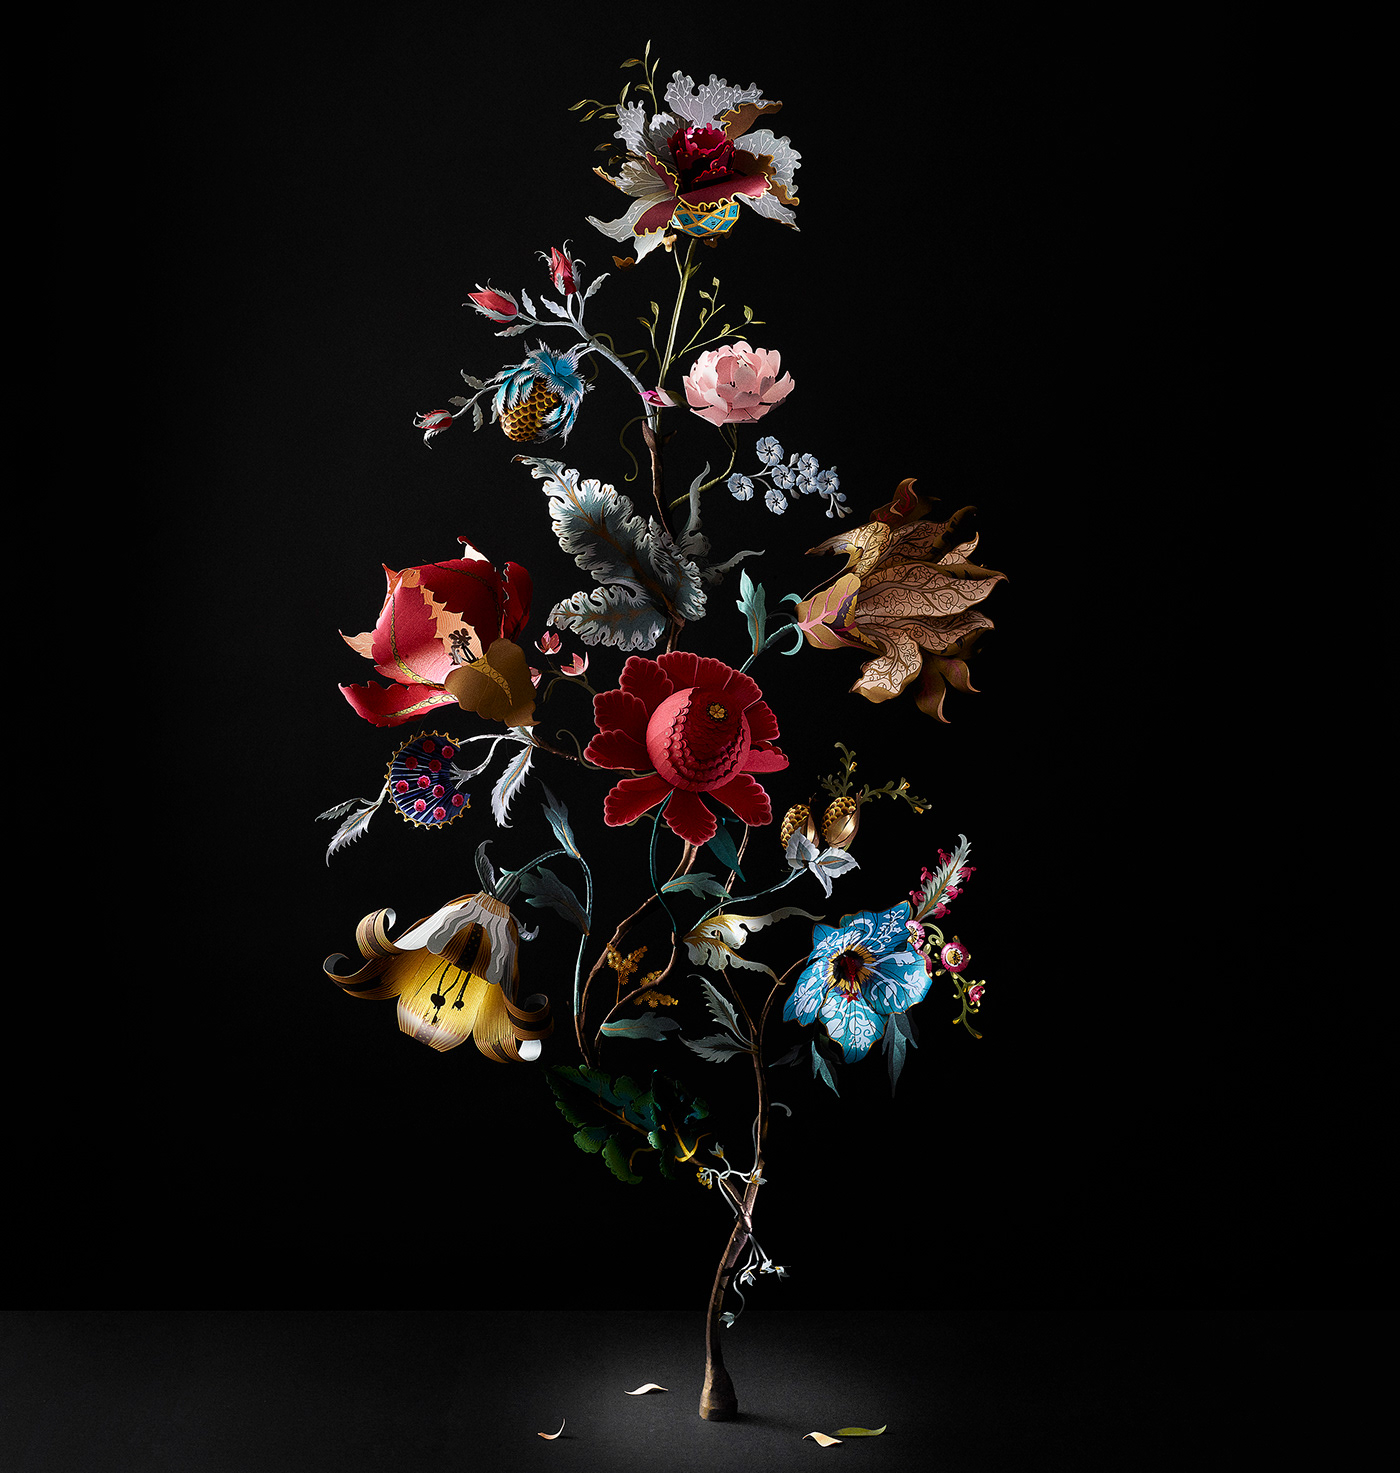 artemis baroque Flowers paper paperart Photography  Victorian wallpaper